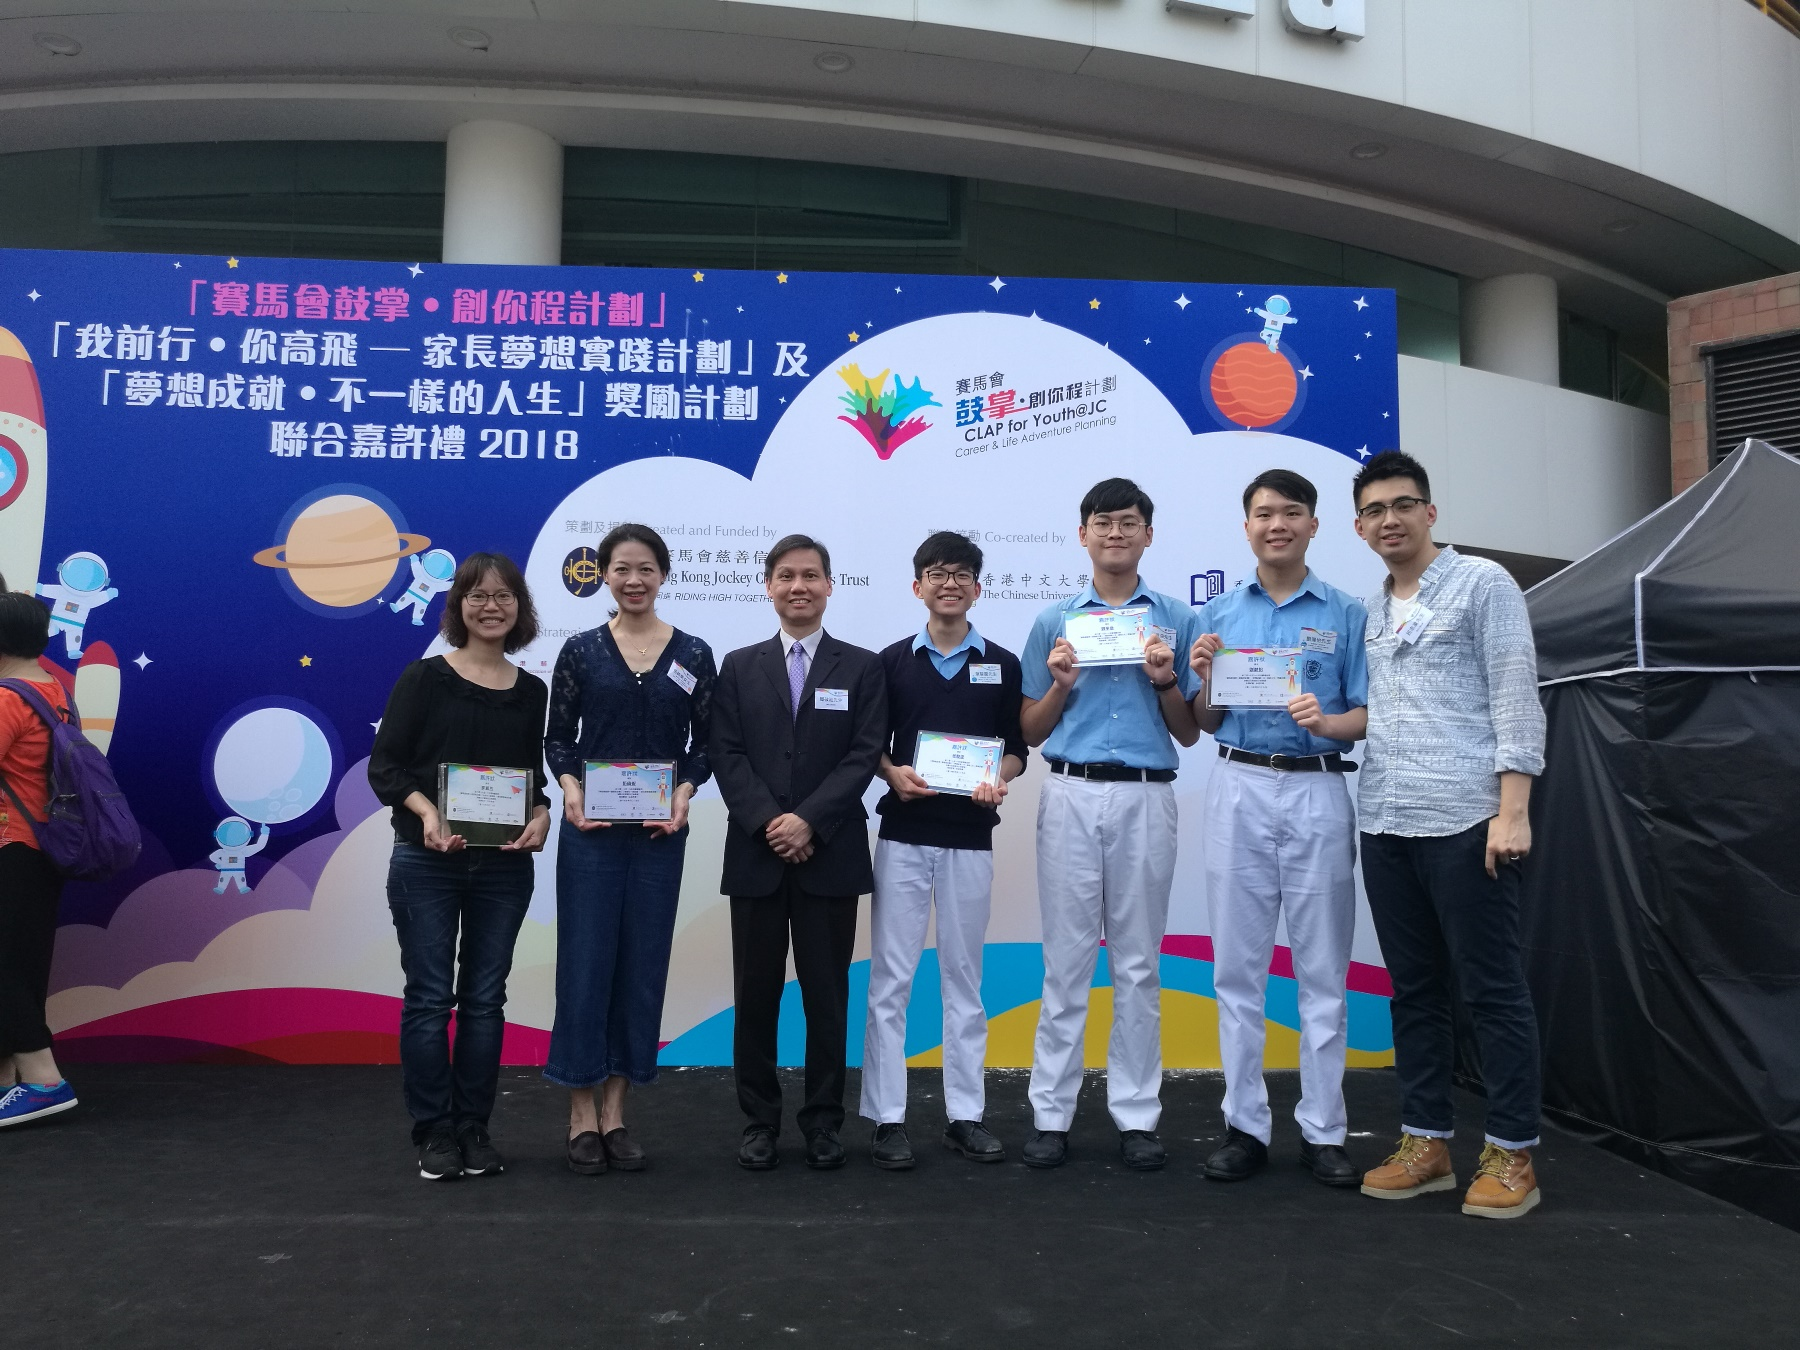 http://npc.edu.hk/sites/default/files/img_20180429_164730.jpg